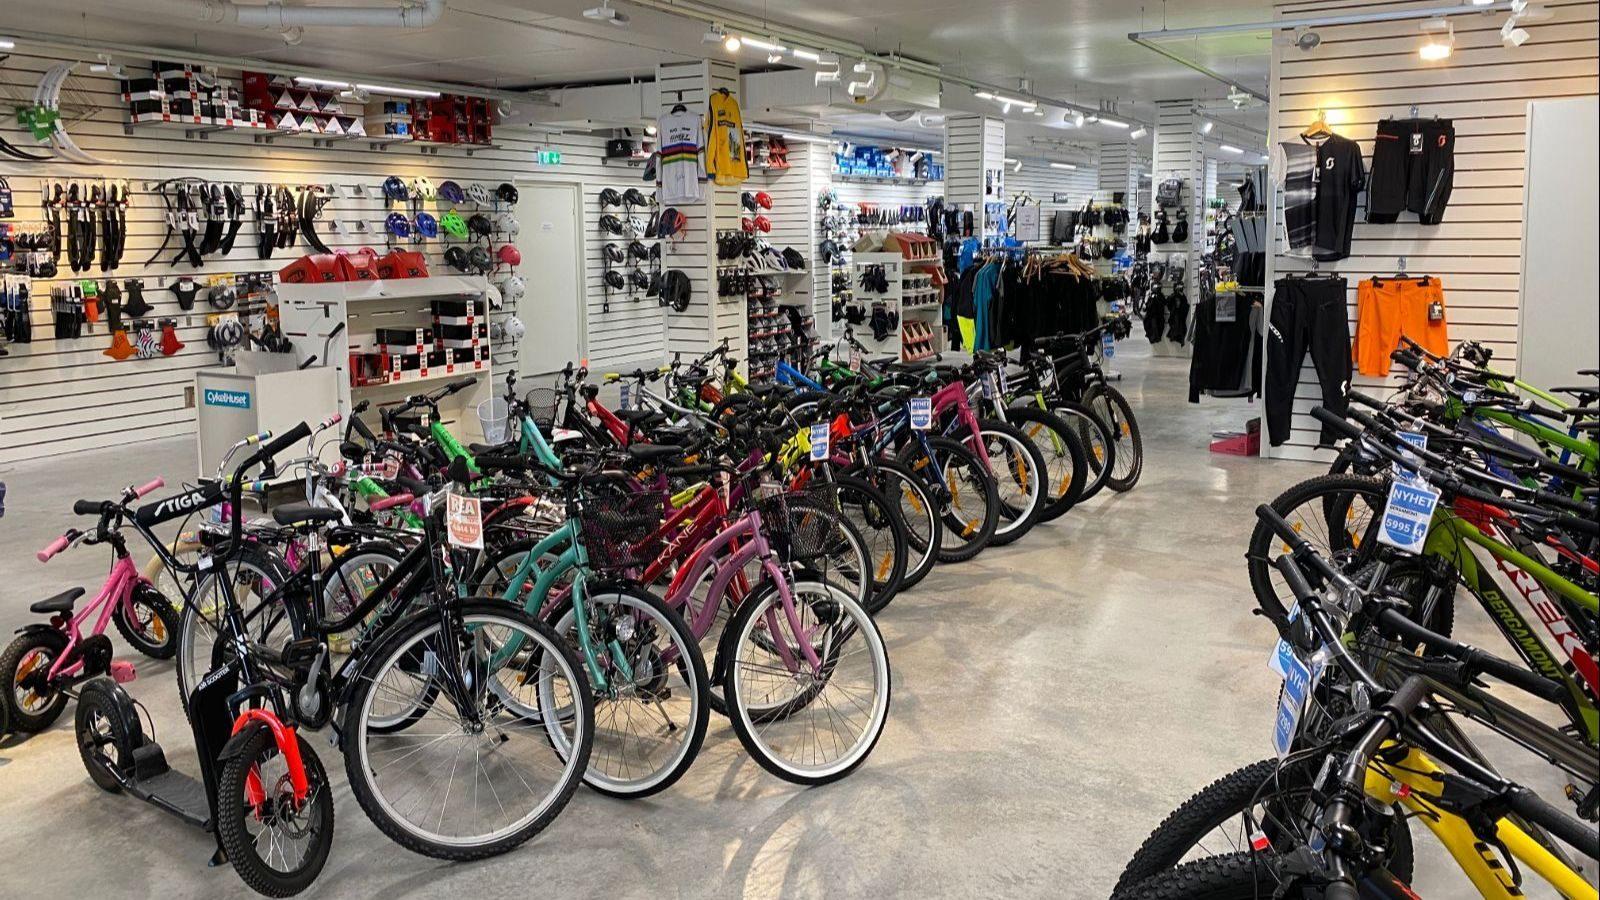 cykelhuset Uddevalla 1600x900 05